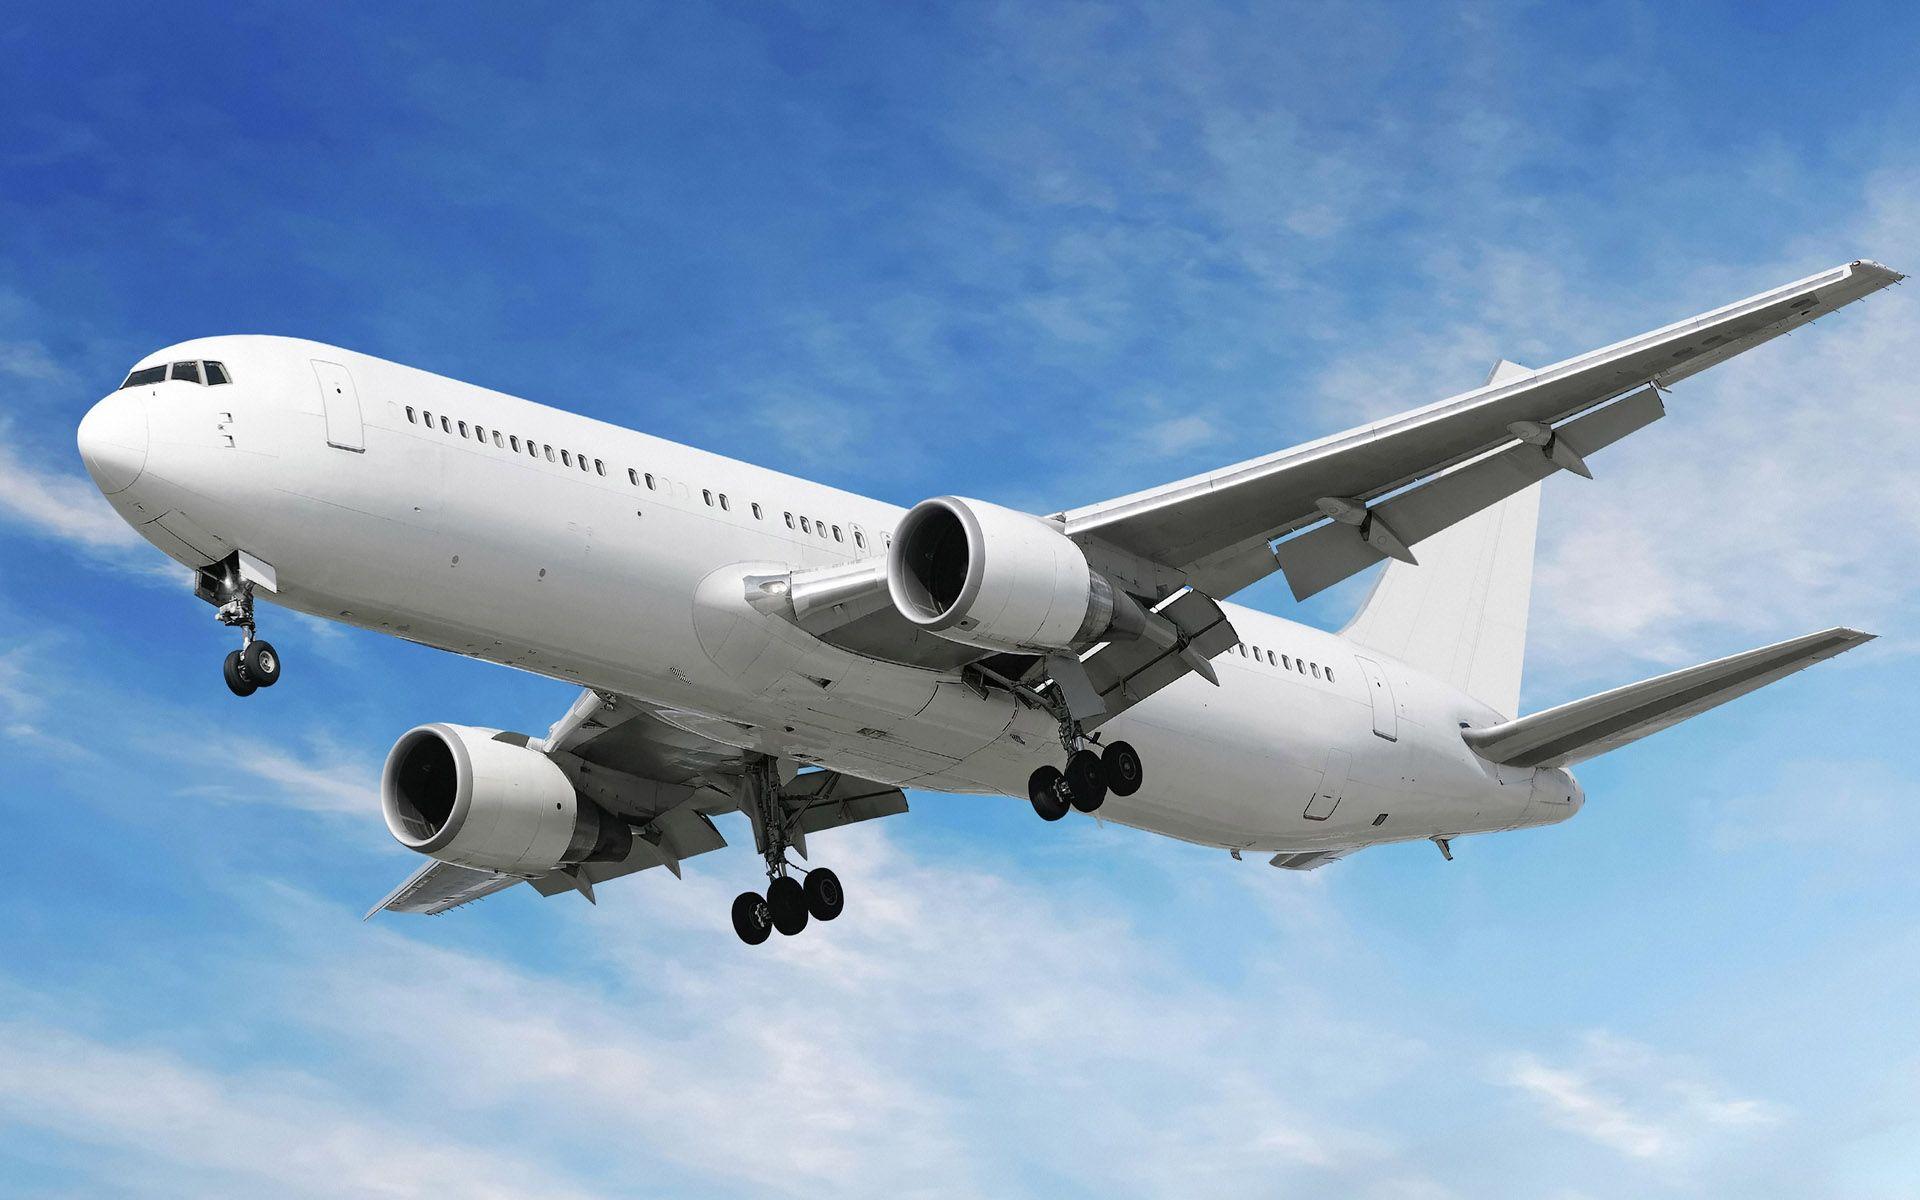 Aviation_The_aircraft_on_landing_approach_015824_.jpg